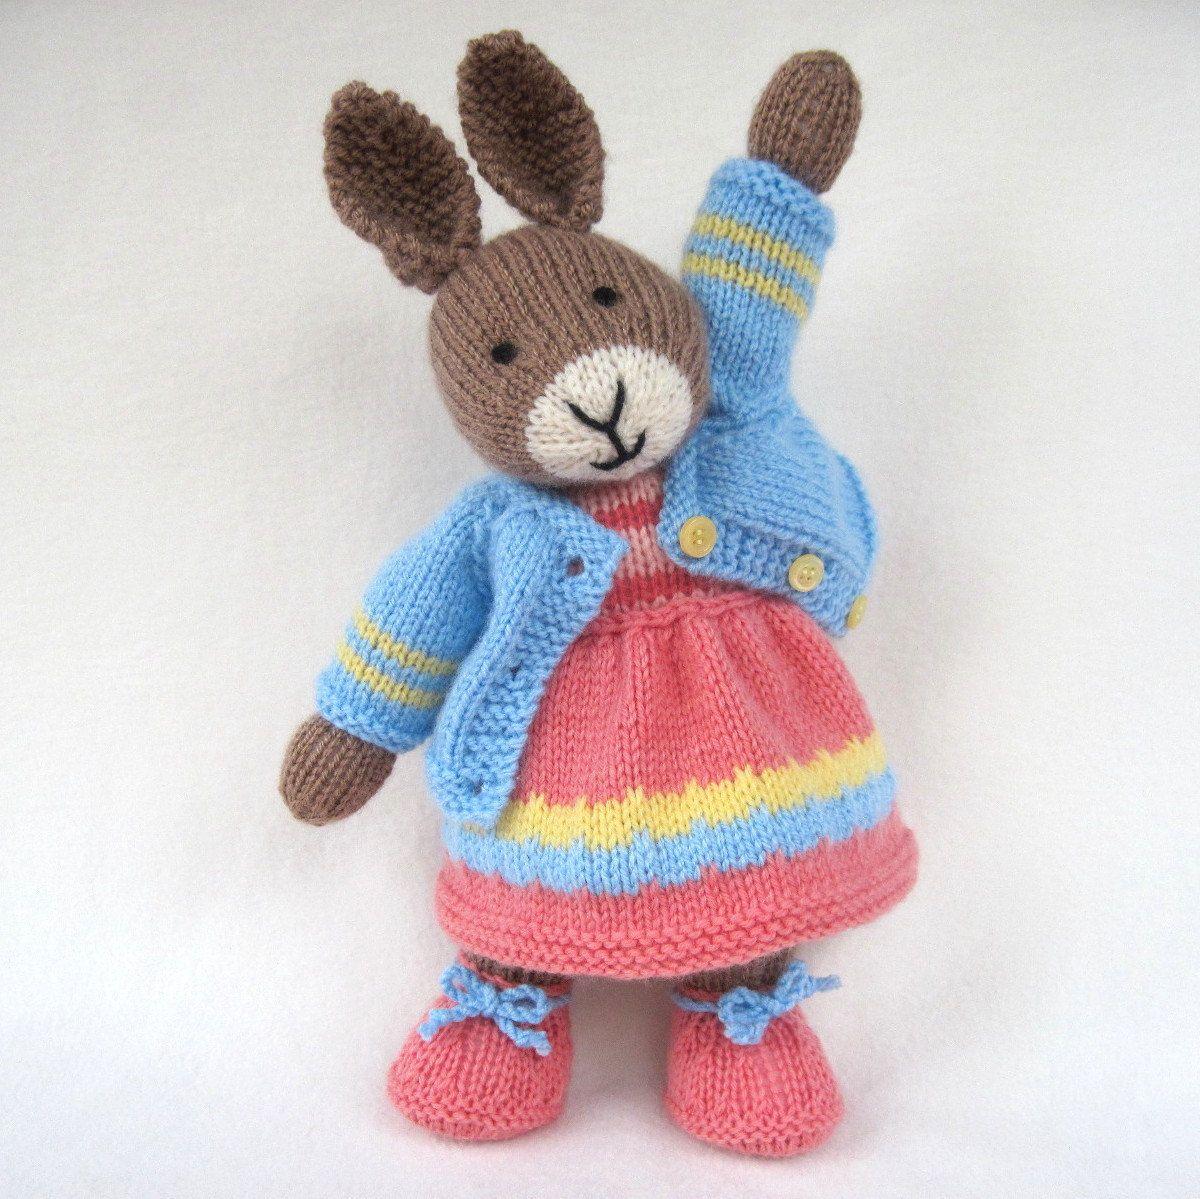 Rabbit Knitting Pattern Toy : Mother bunny rabbit doll knitting pattern instant